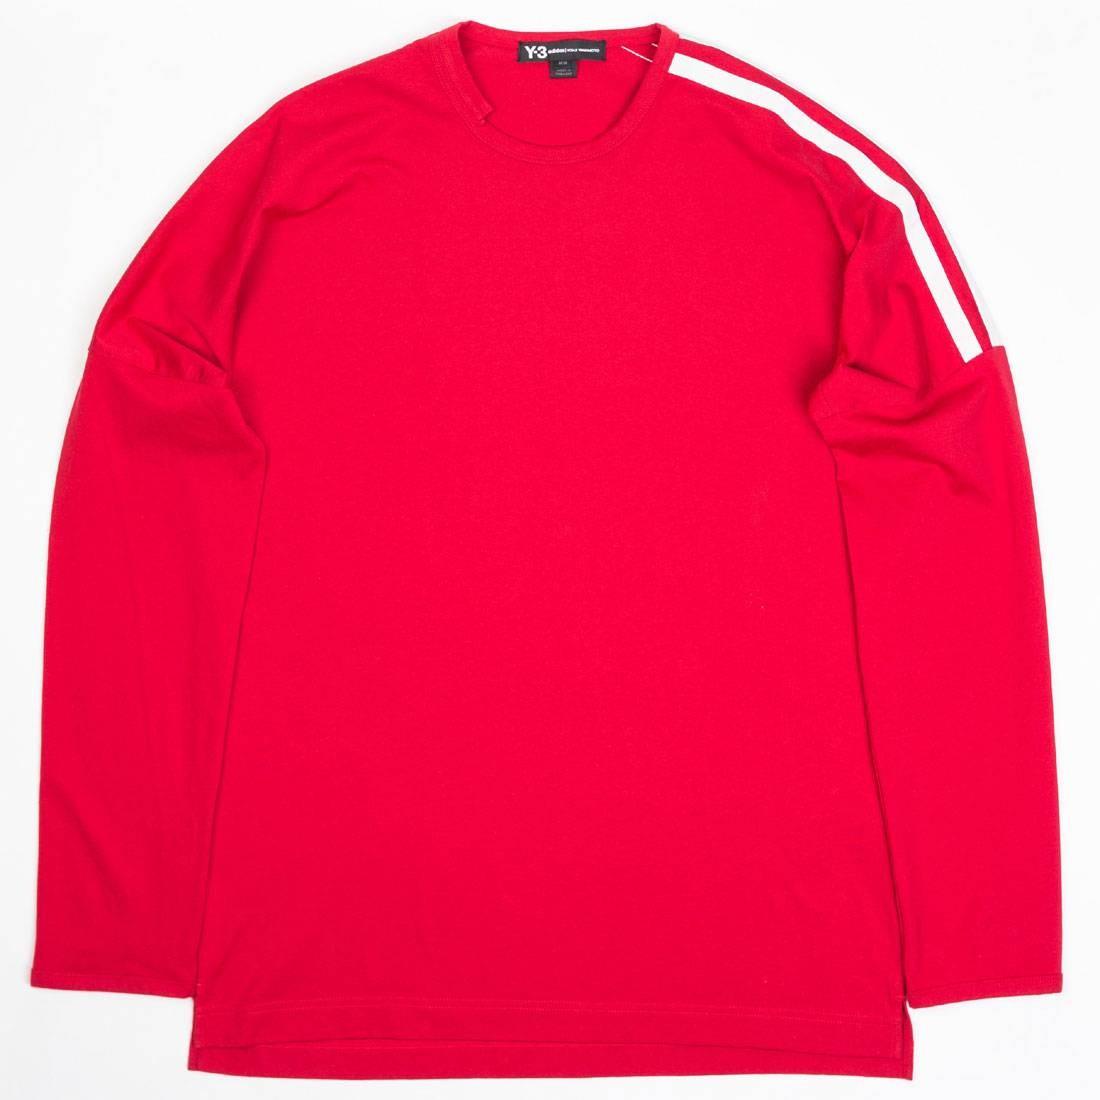 Adidas Y-3 Men 3-Stripes Long Sleeve Tee (chili pepper / core white)